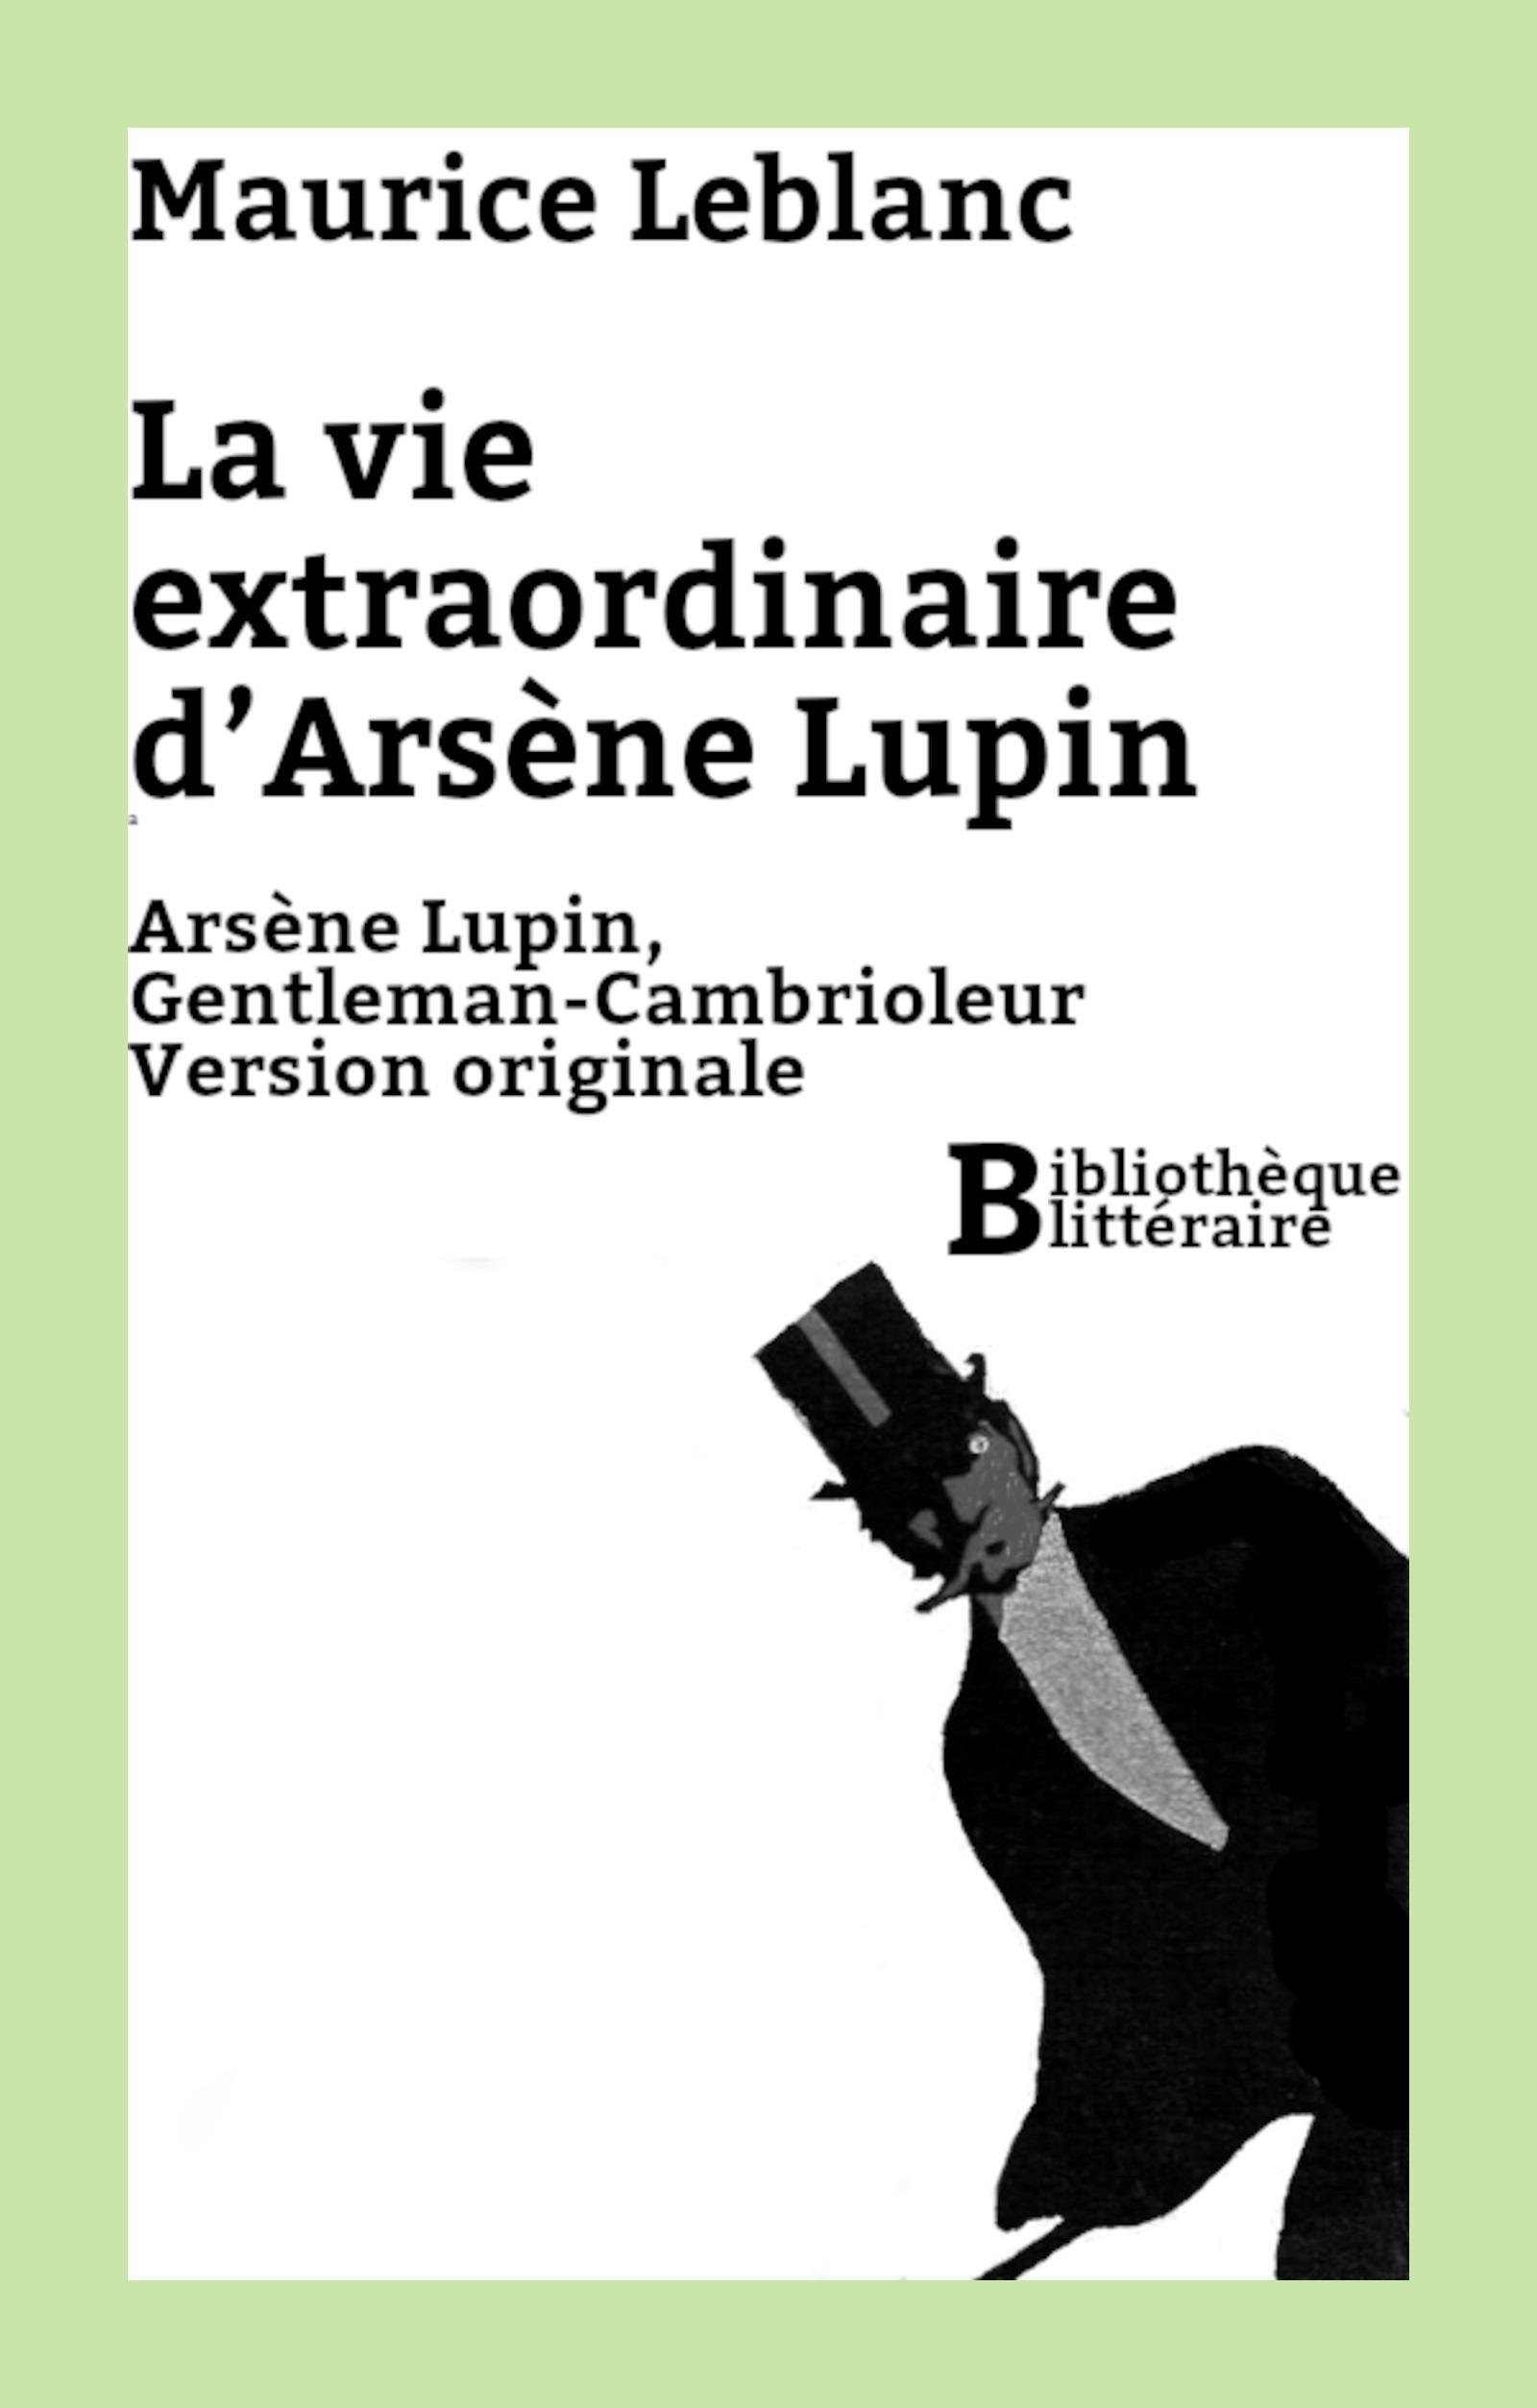 La vie extraordinaire d'Arsène Lupin